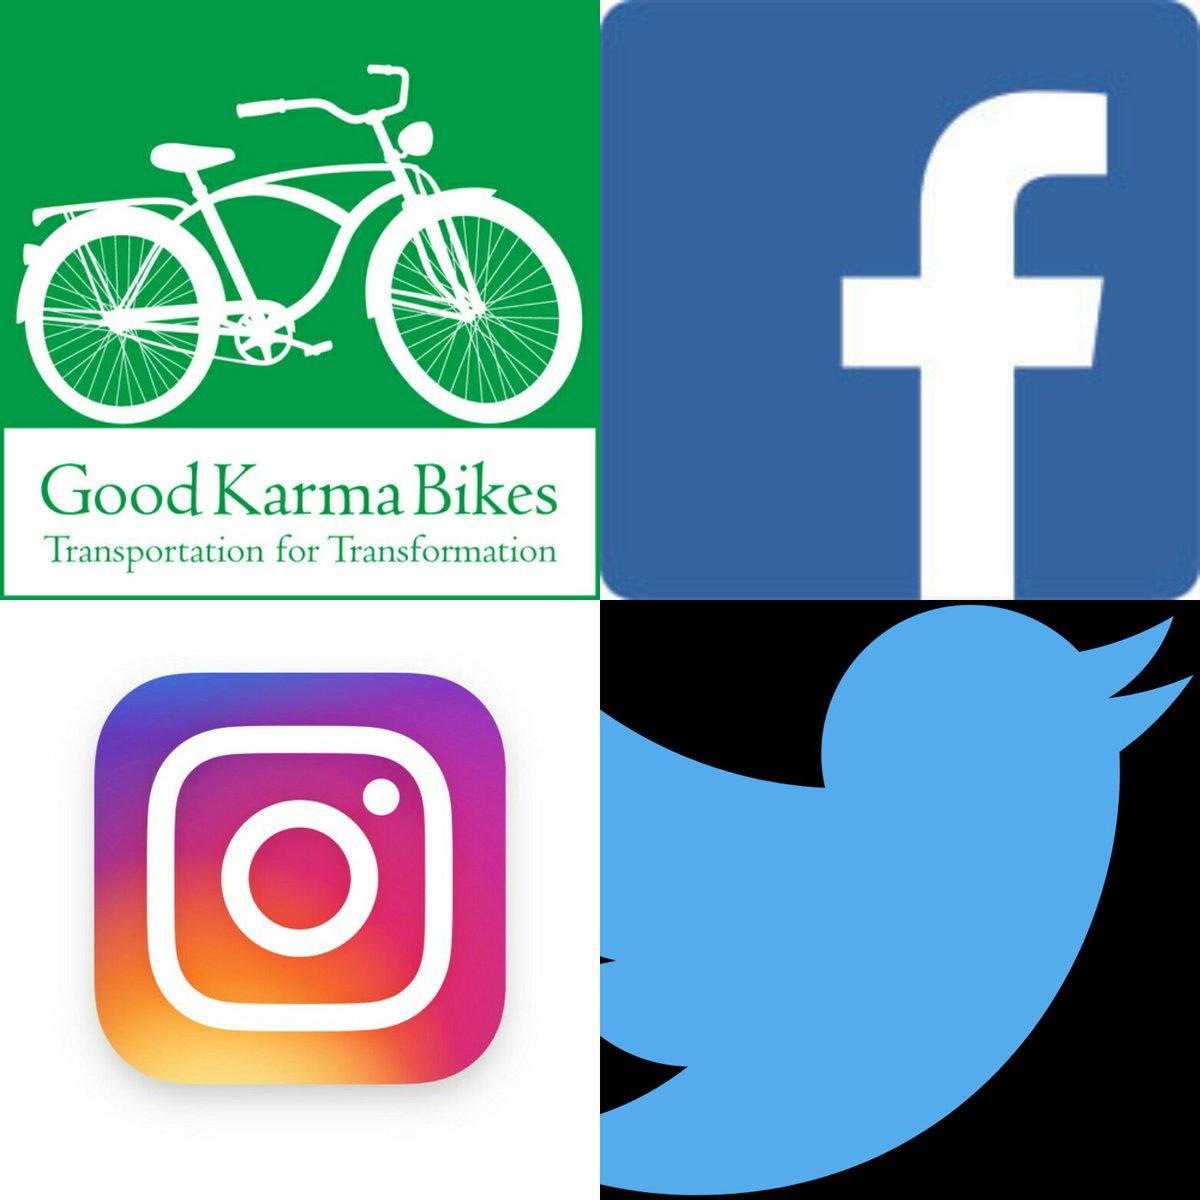 Good Karma Bikes >> Good Karma Bikes On Twitter Come Show Us A Post About Good